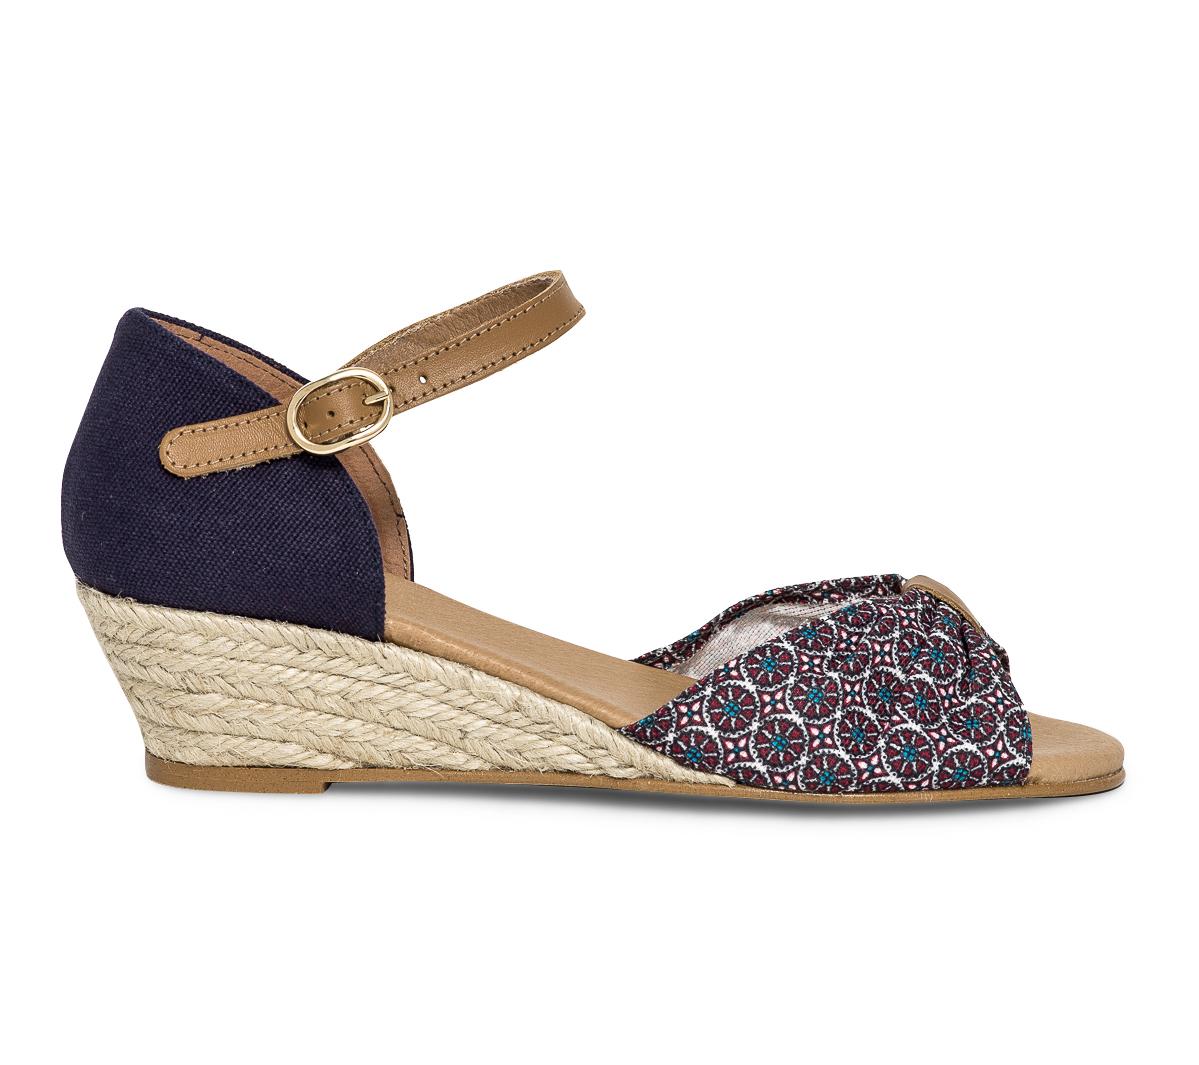 Bleue Et Sandale Eram Compensée Wax GVpqUzSM